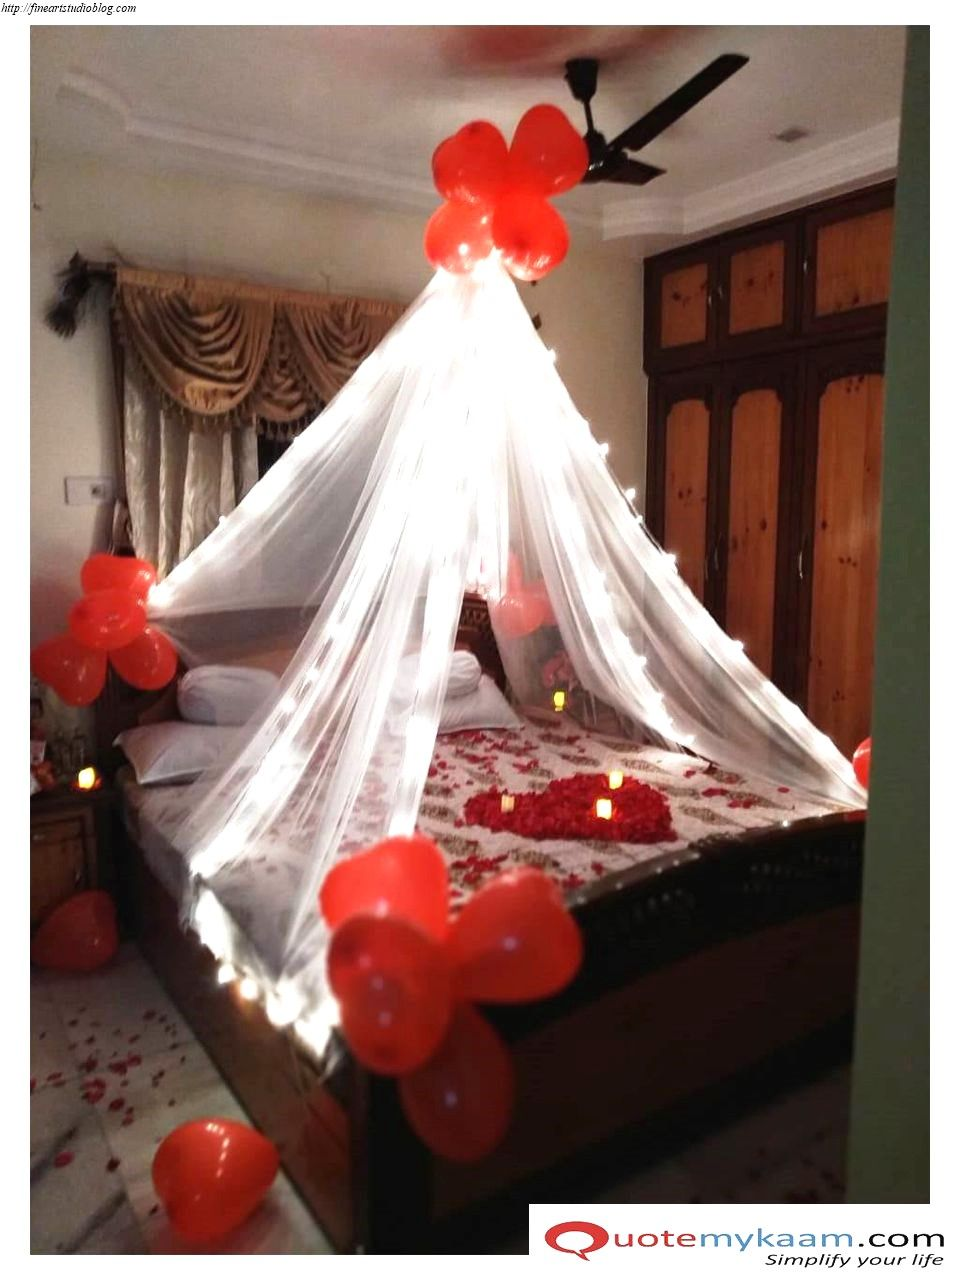 37 Fascinating Room Decoration Ideas For Anniversary Scheme Fine Art Studio In 2020 Wedding Room Decorations Romantic Room Wedding Night Room Decorations